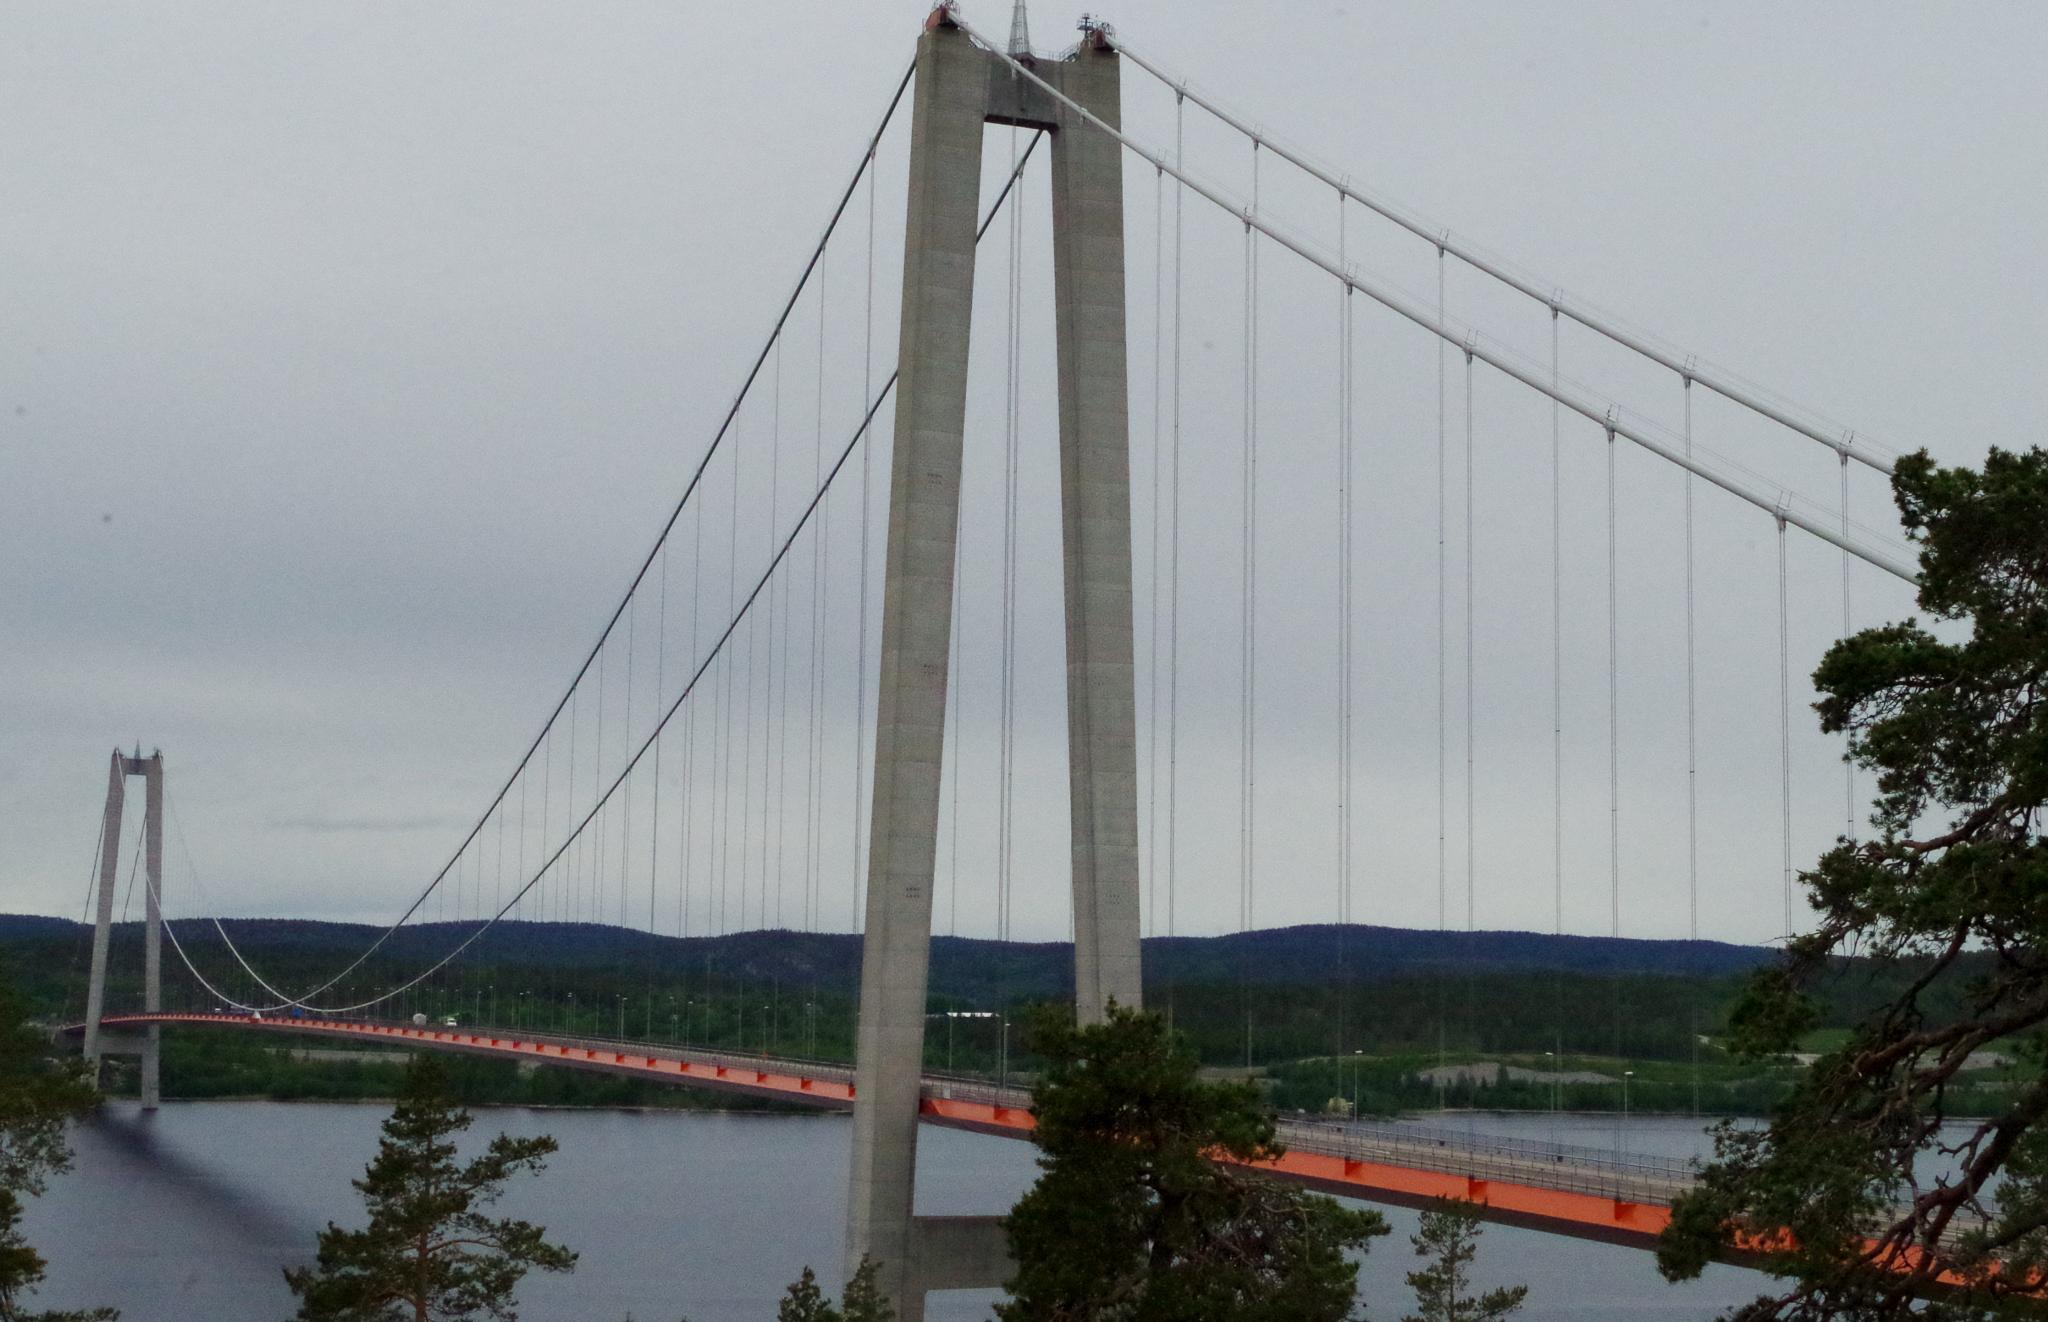 The High Coast Bridge  by MsVoff